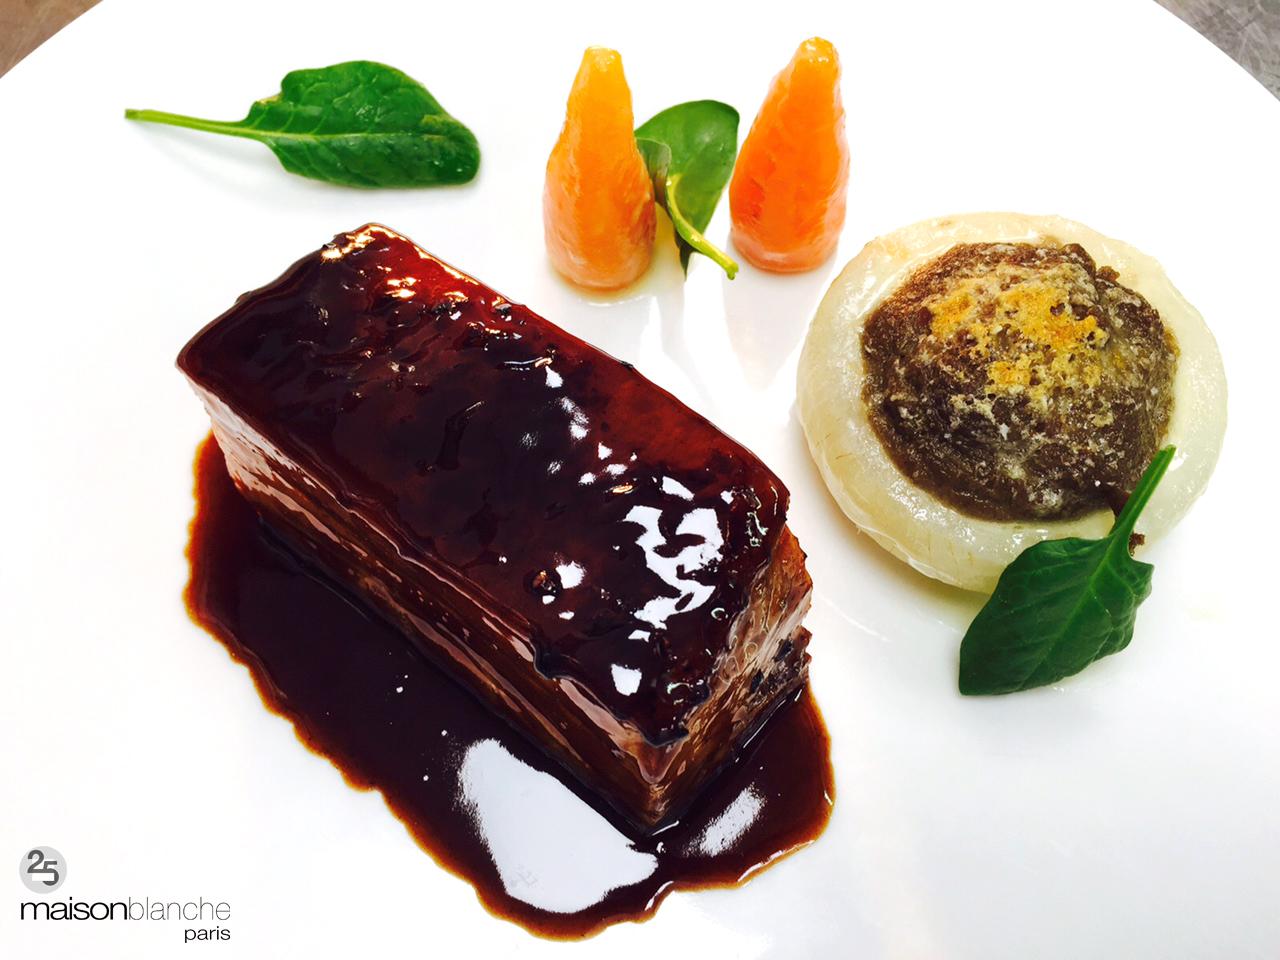 http://www.fleurymichon.fr/plats-cuisines-individuels